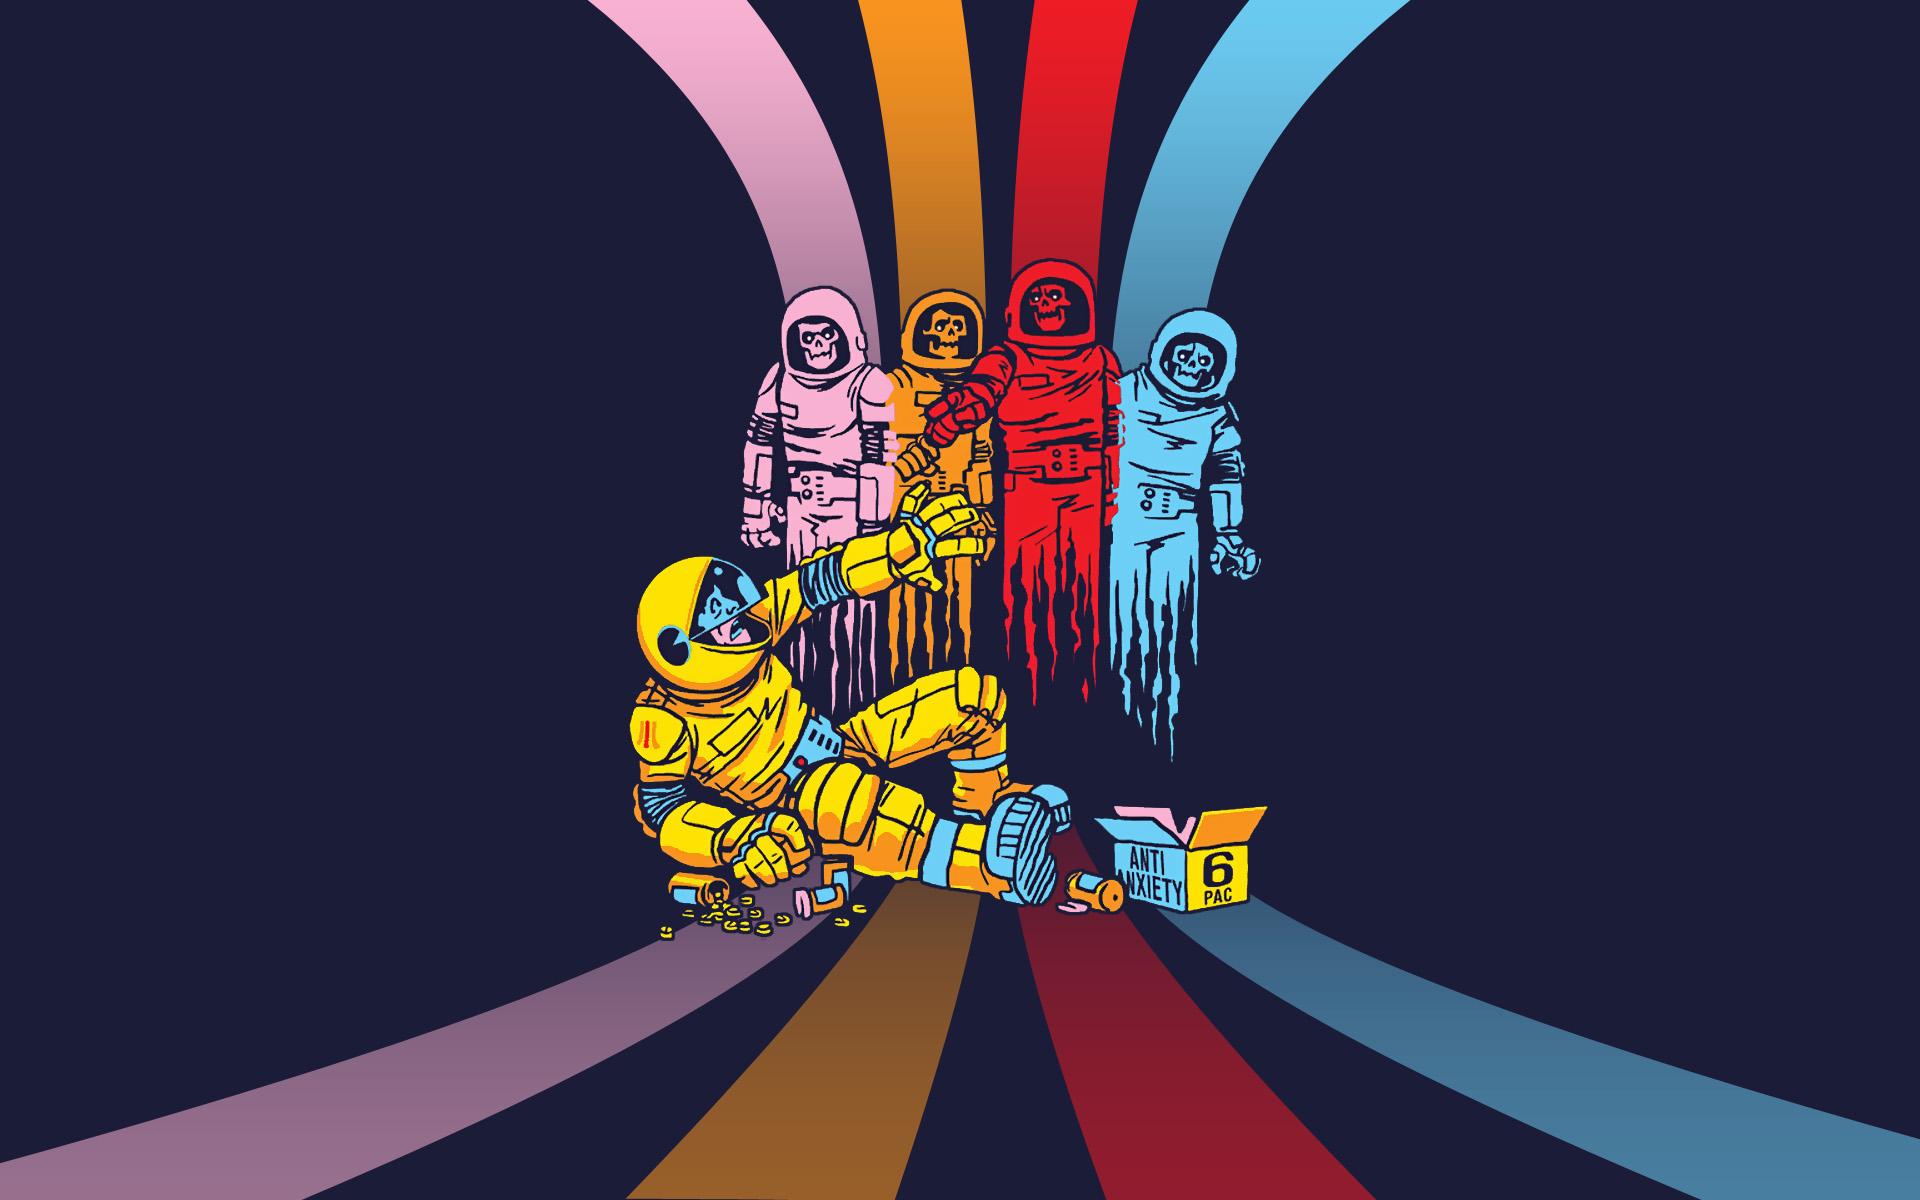 Pacman Wallpaper 1920x1200 52606